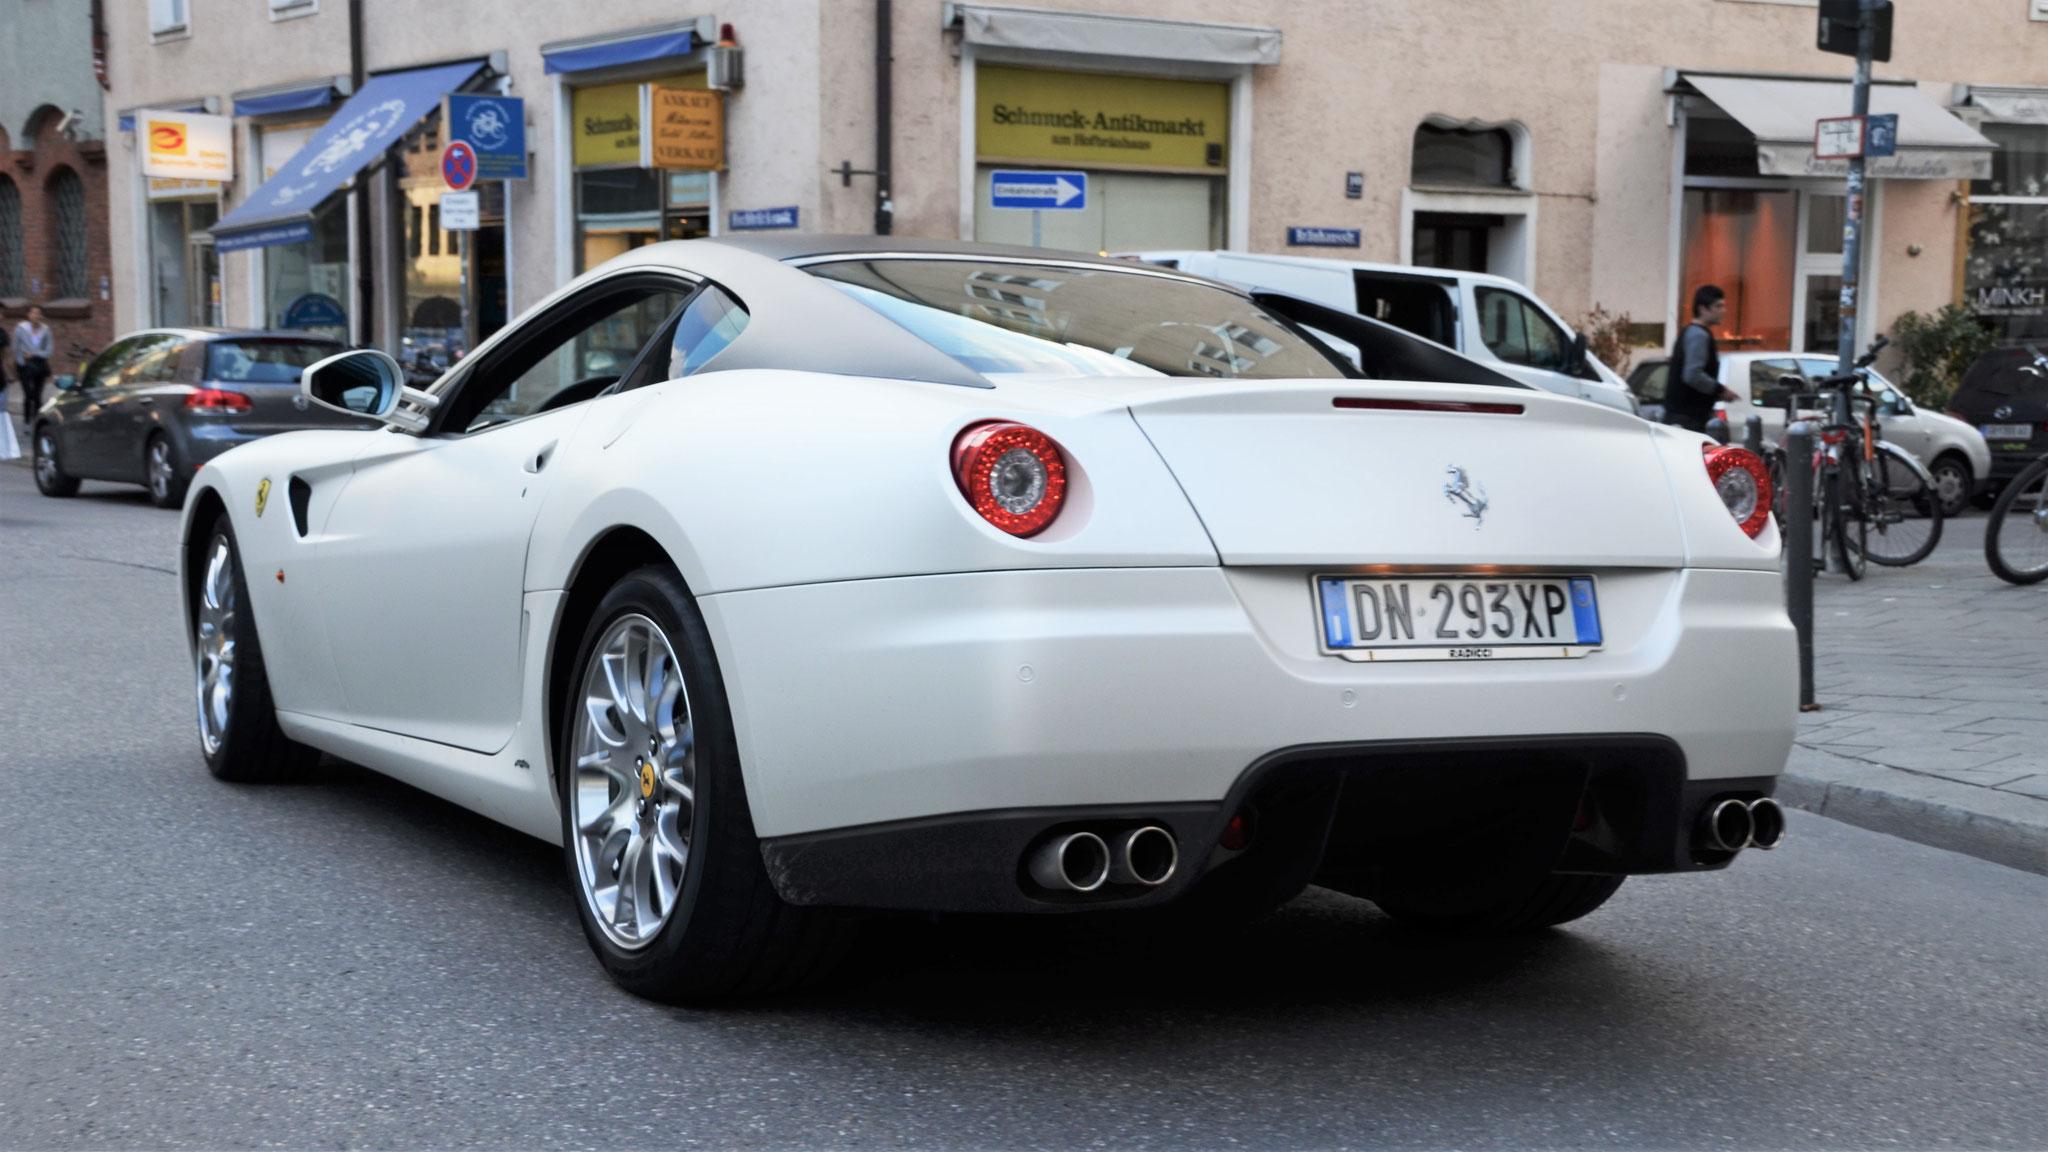 Ferrari 599 GTB - DN-293-XP (ITA)